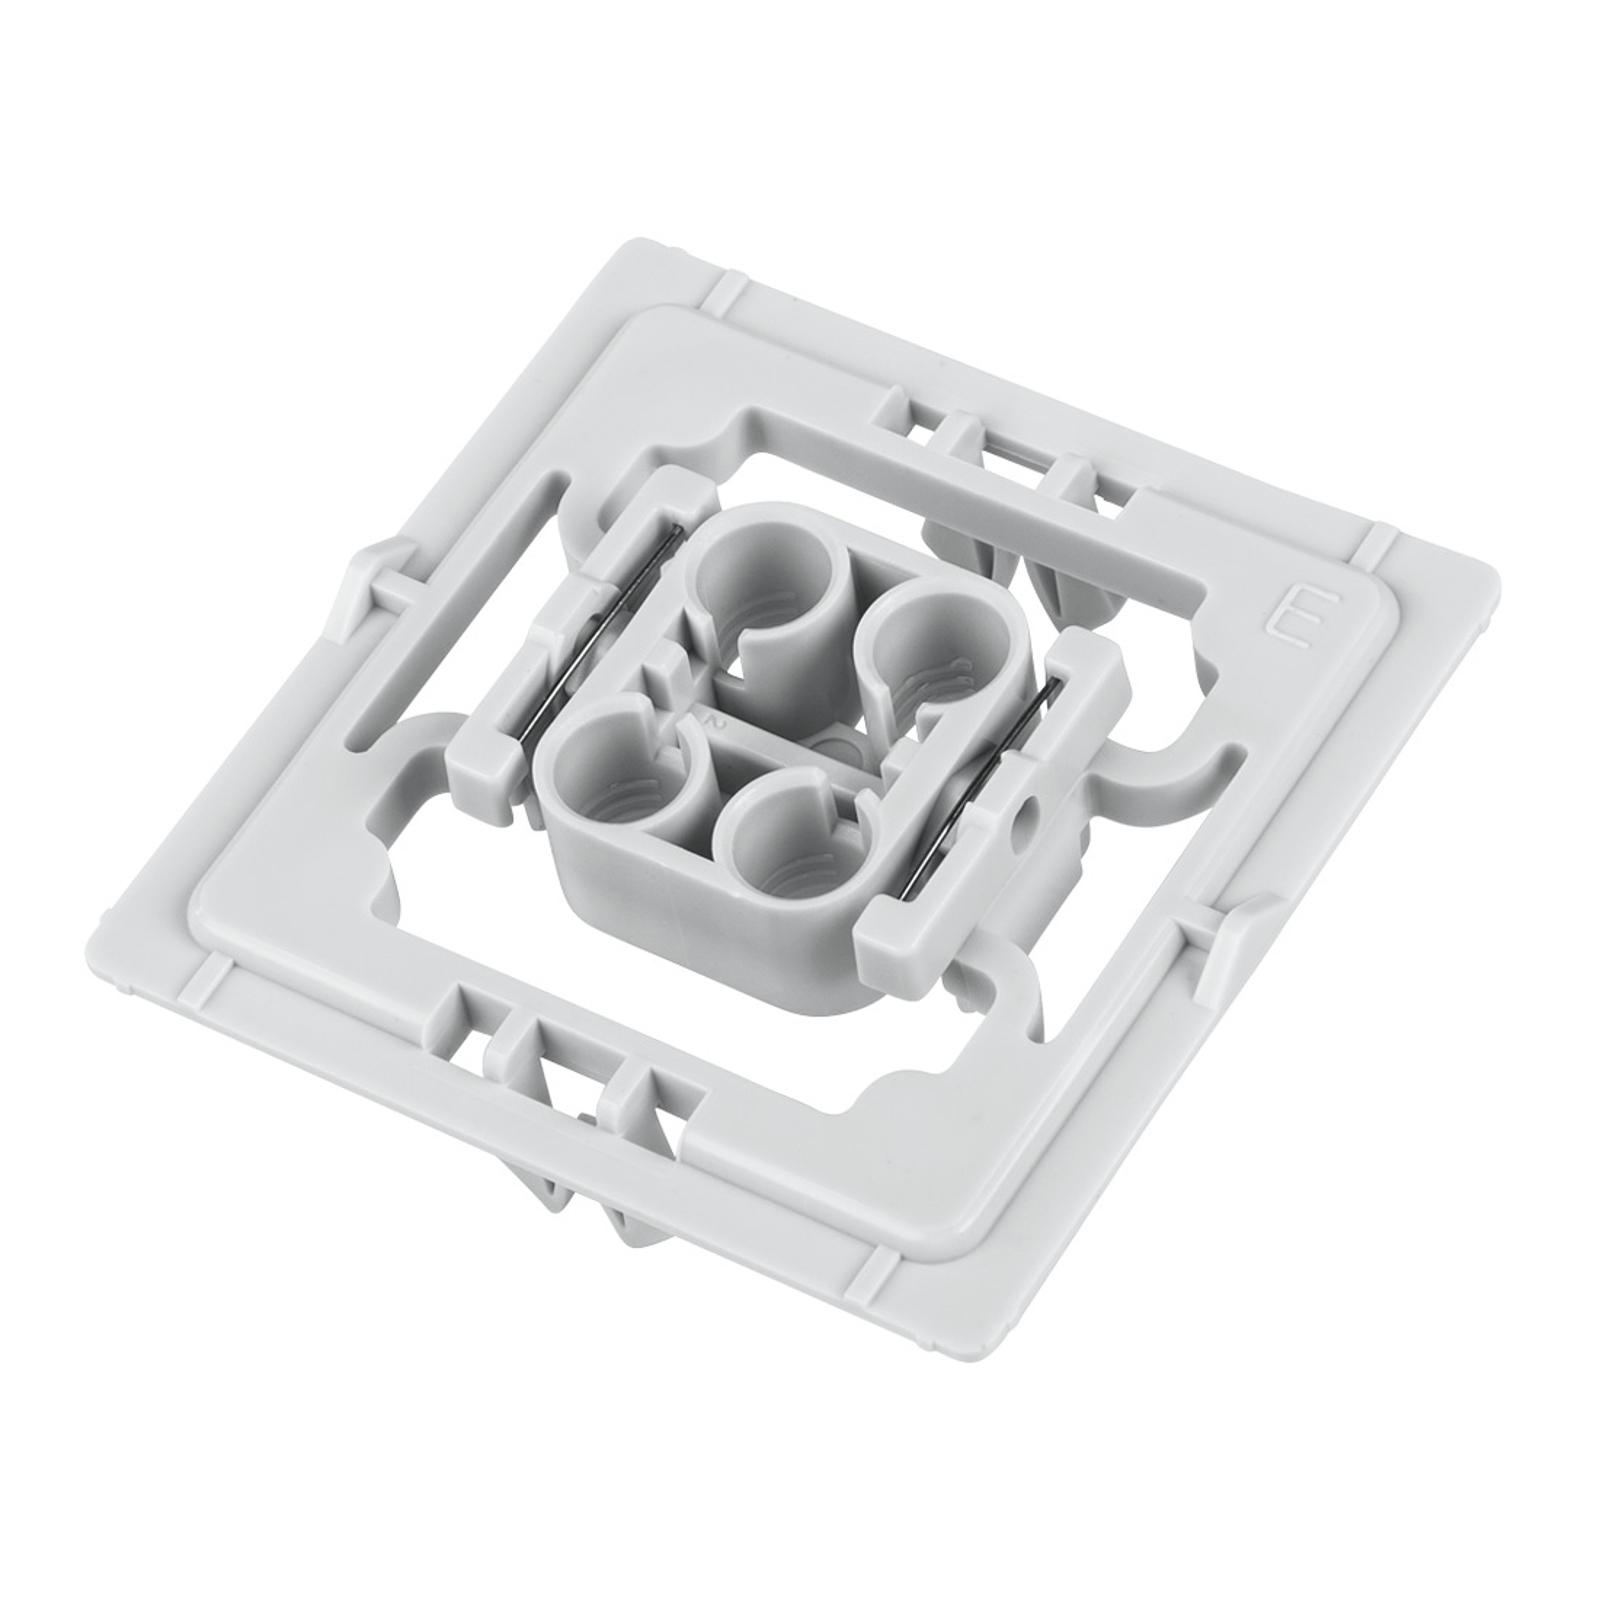 Homematic IP adaptateur interrupteurs ELSO Joy 20x